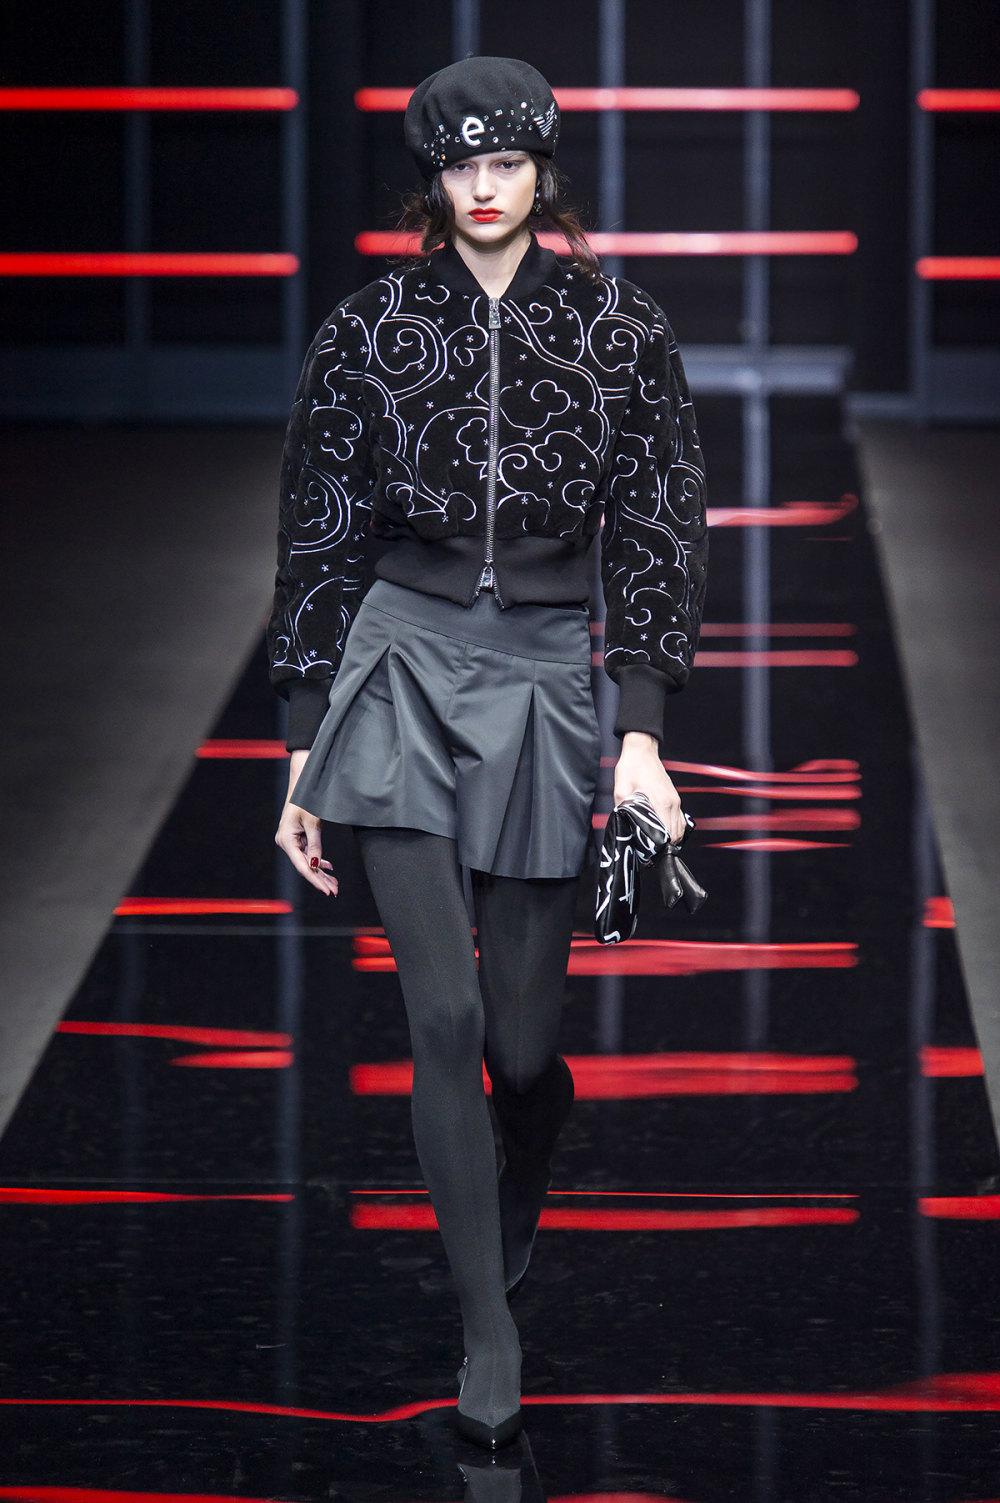 Emporio Armani时装系列畅的裤子带有柔滑裙子的鸡尾酒礼服-31.jpg